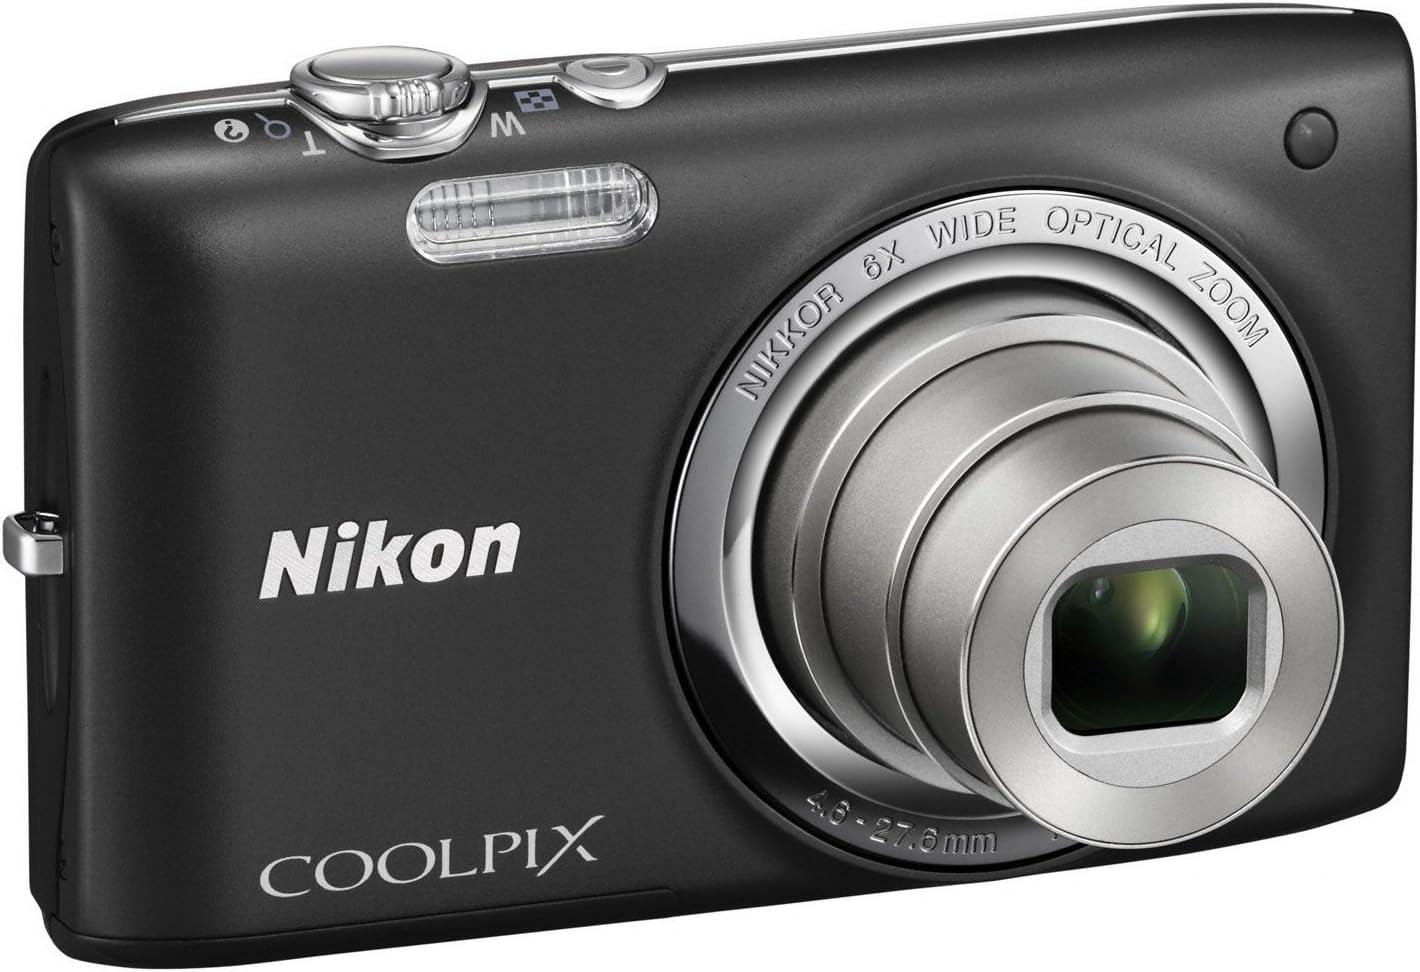 Nikon Coolpix S2700 Digitalkamera 2 7 Zoll Schwarz Kamera